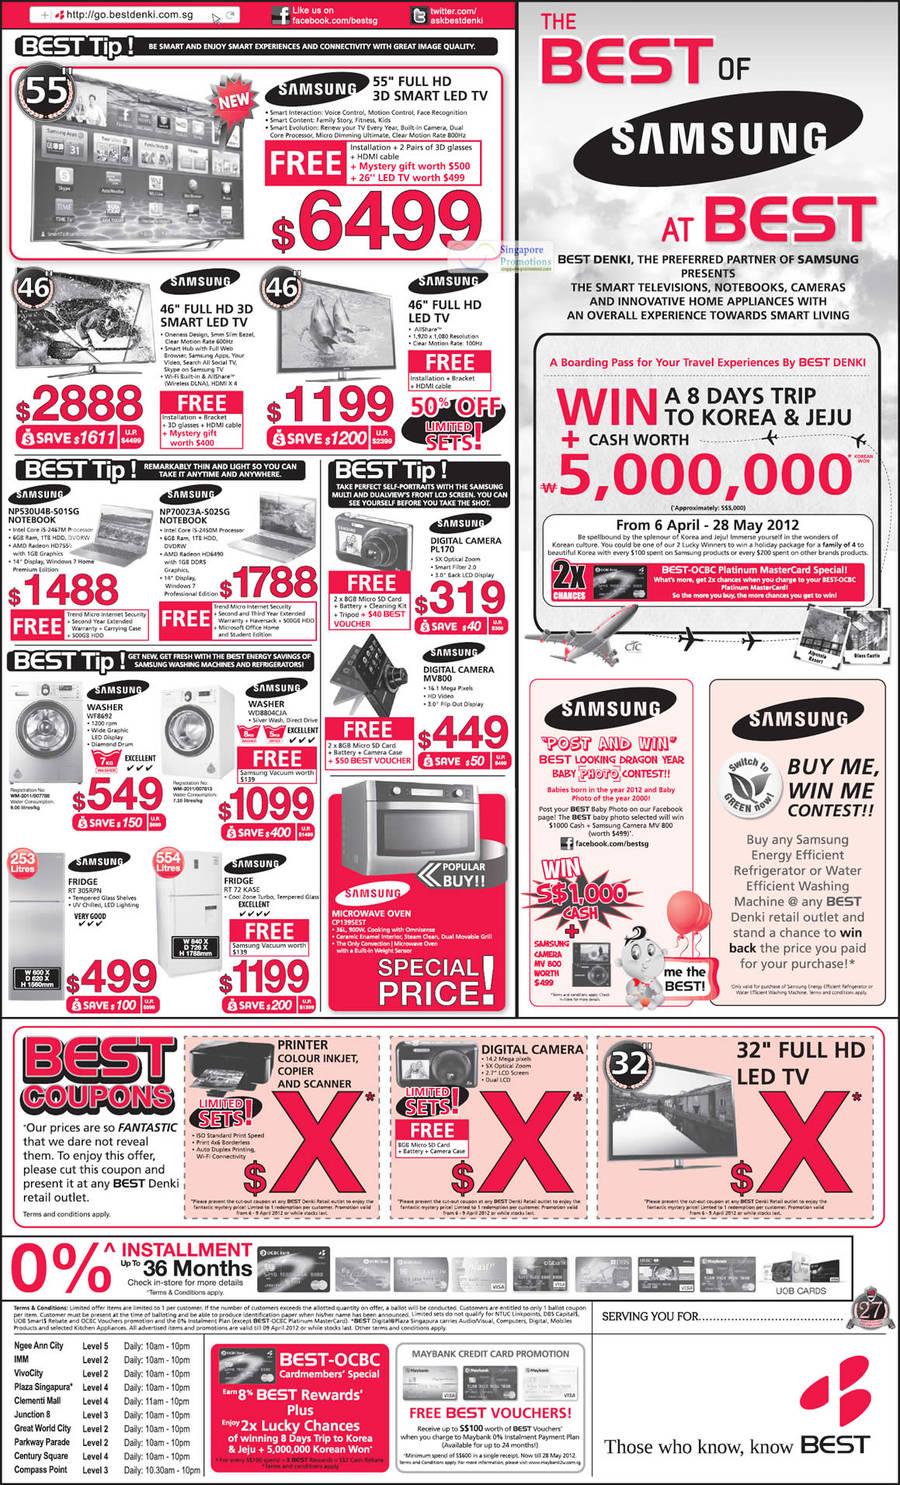 13 April Samsung TV, Digital Cameras, Appliances